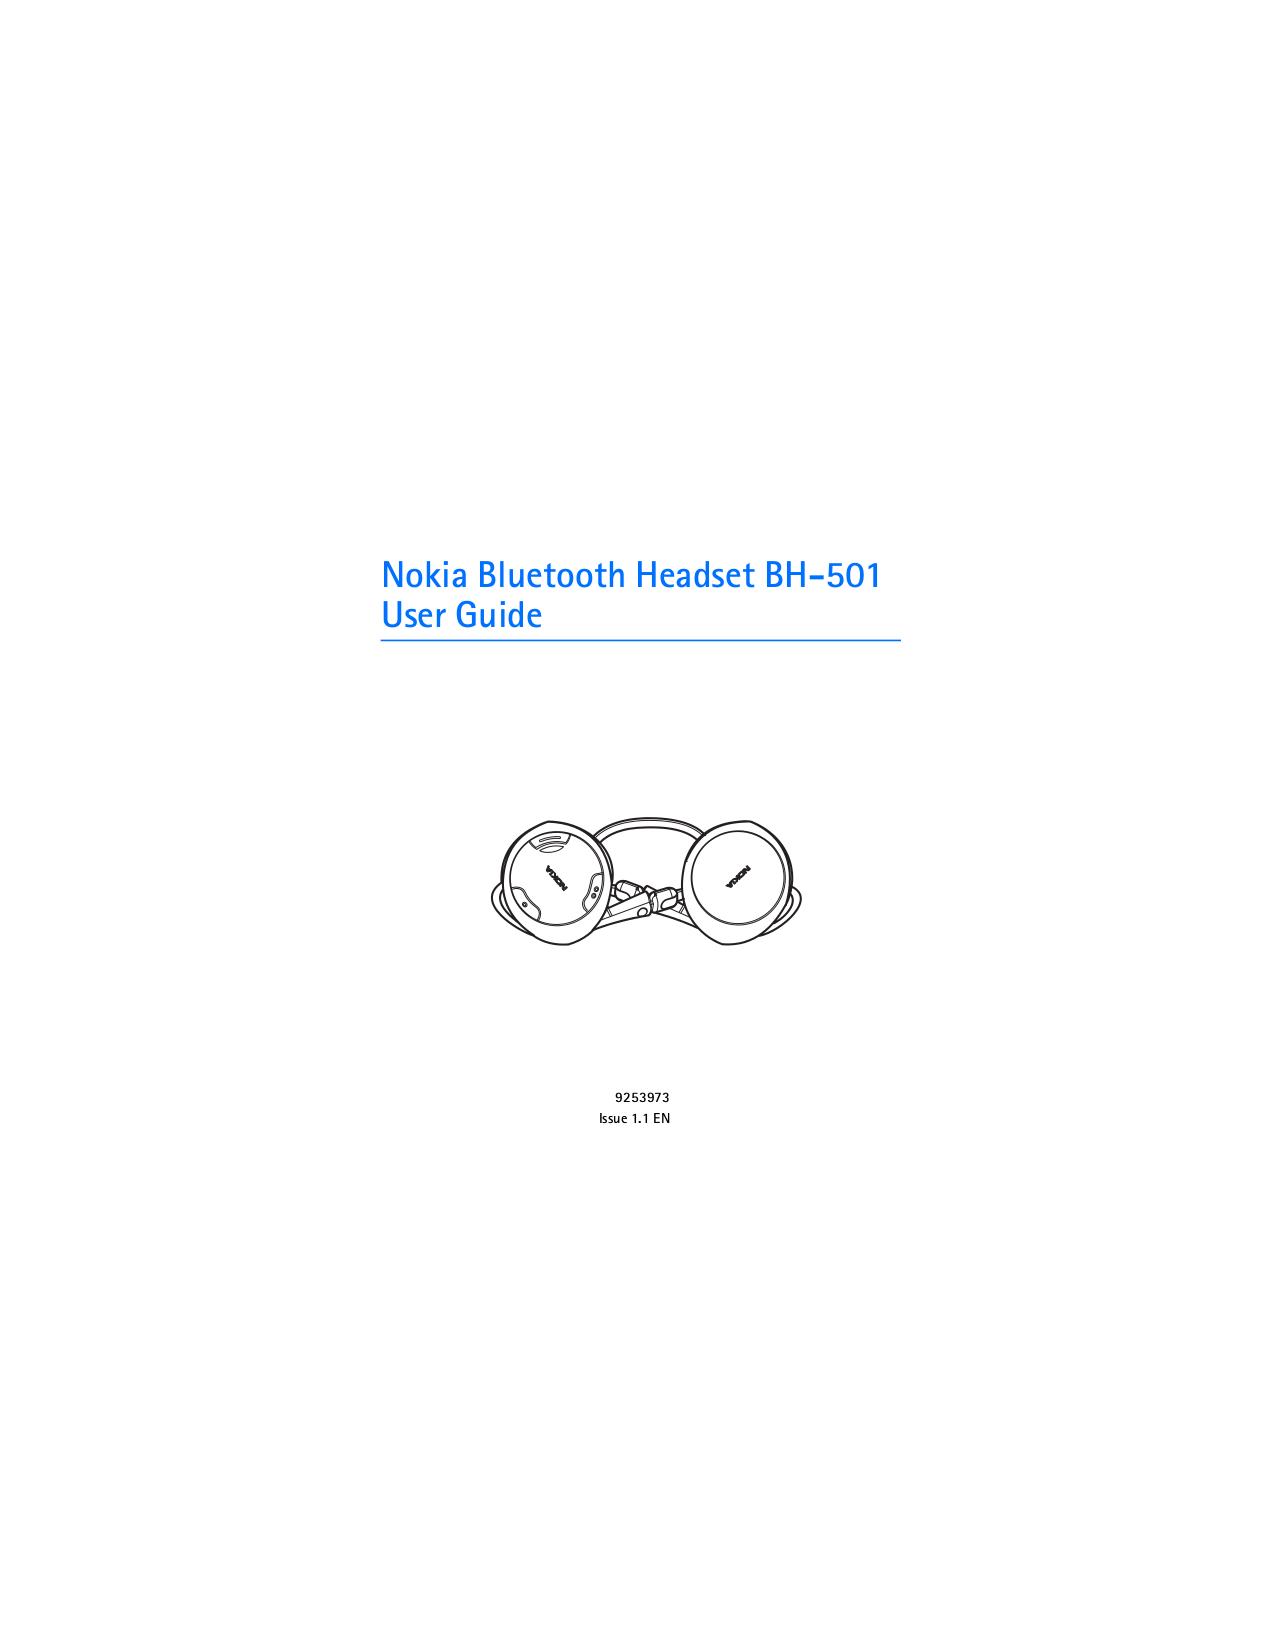 pdf for Nokia Headset BH-501 manual